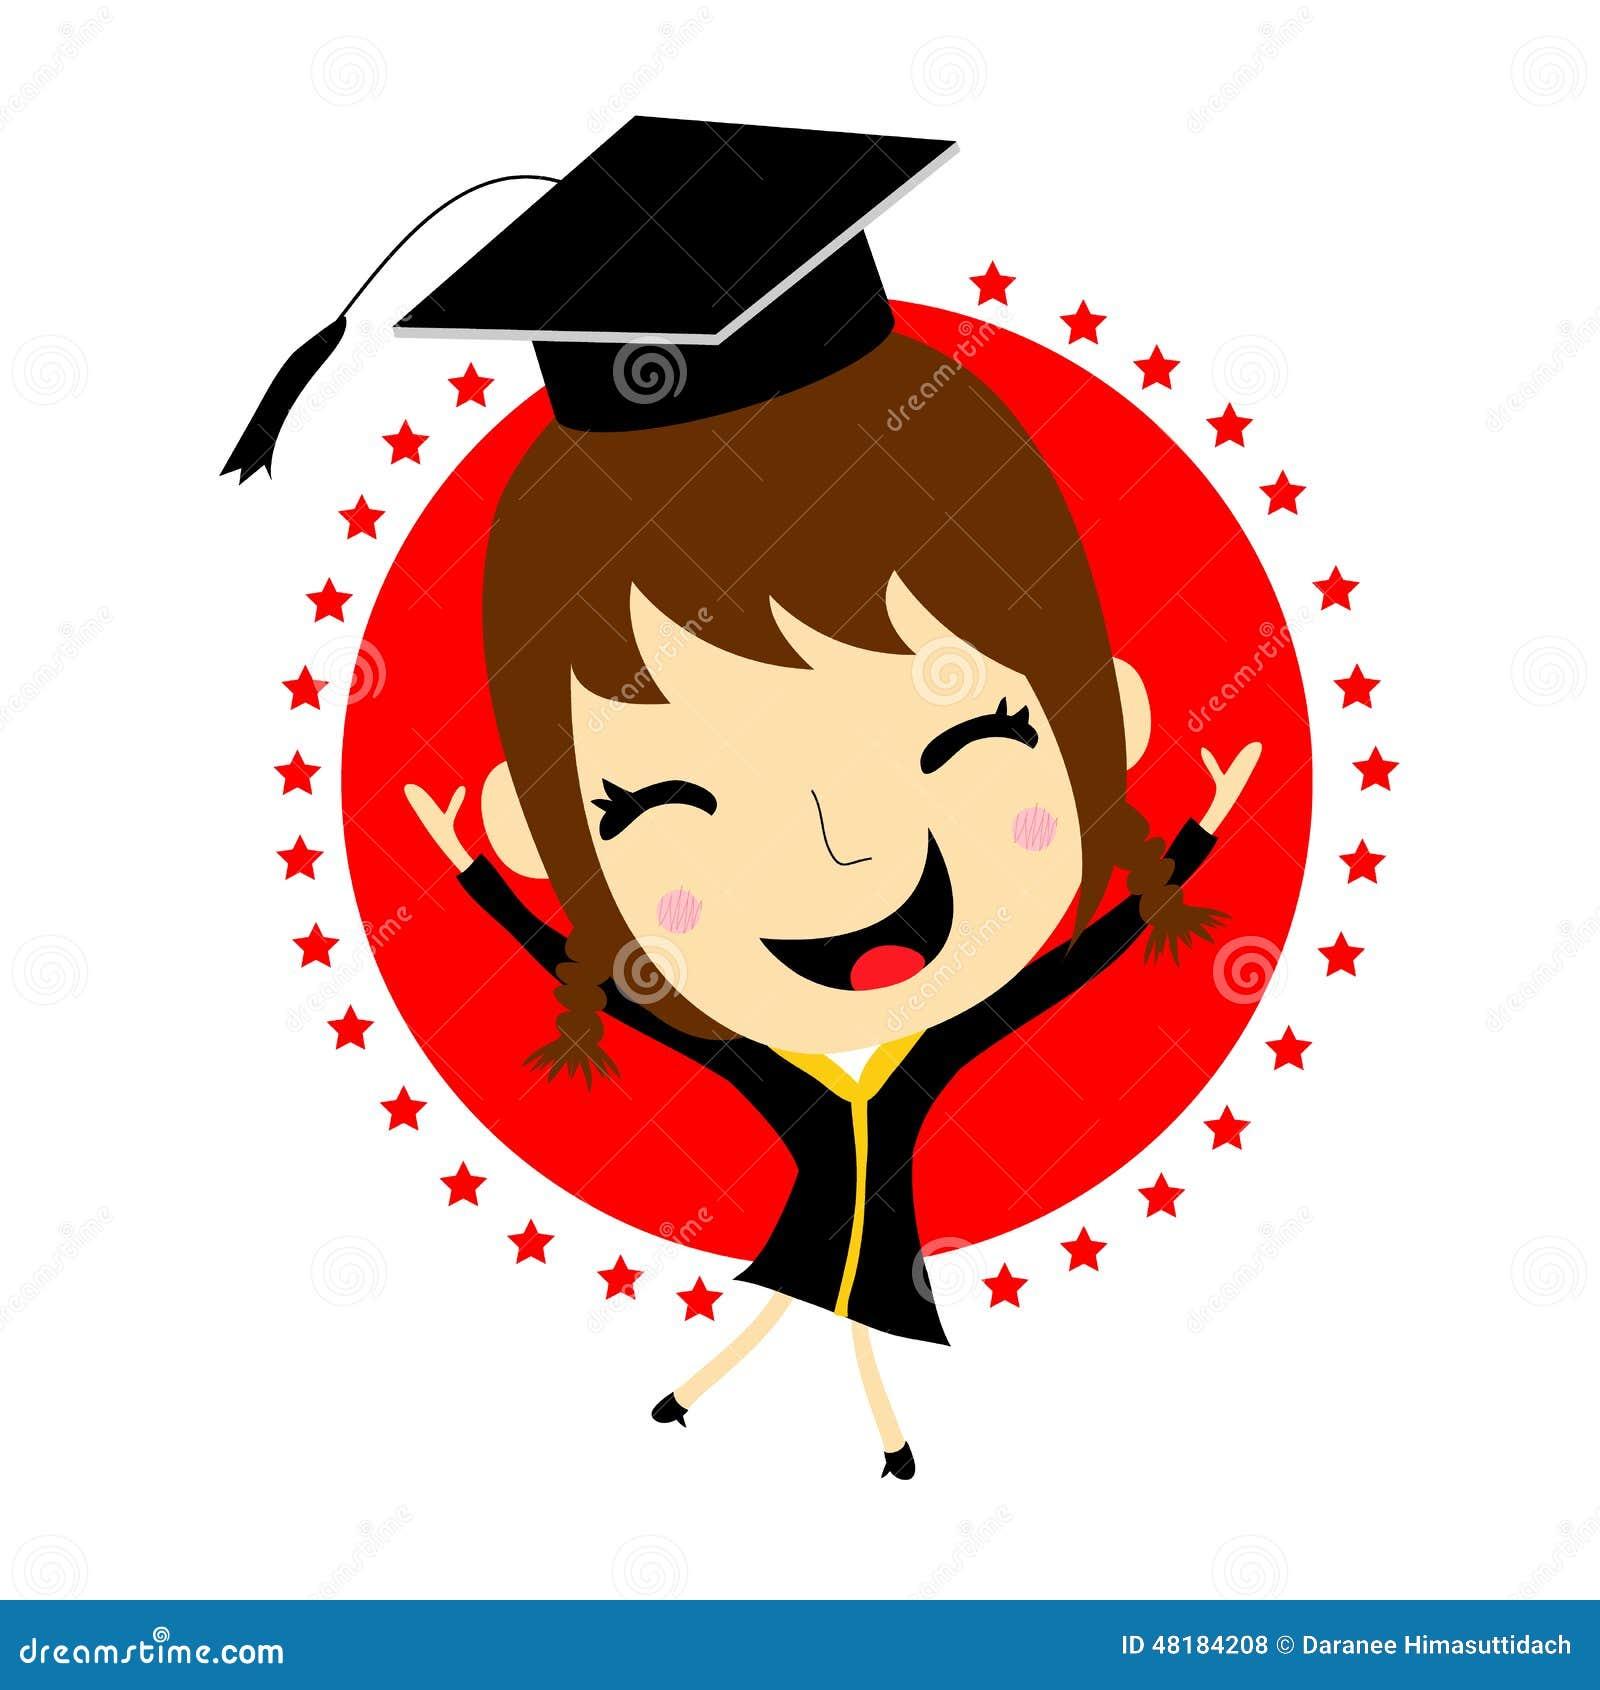 Girl Cartoon Graduation Vector Stock Vector - Image: 48184208